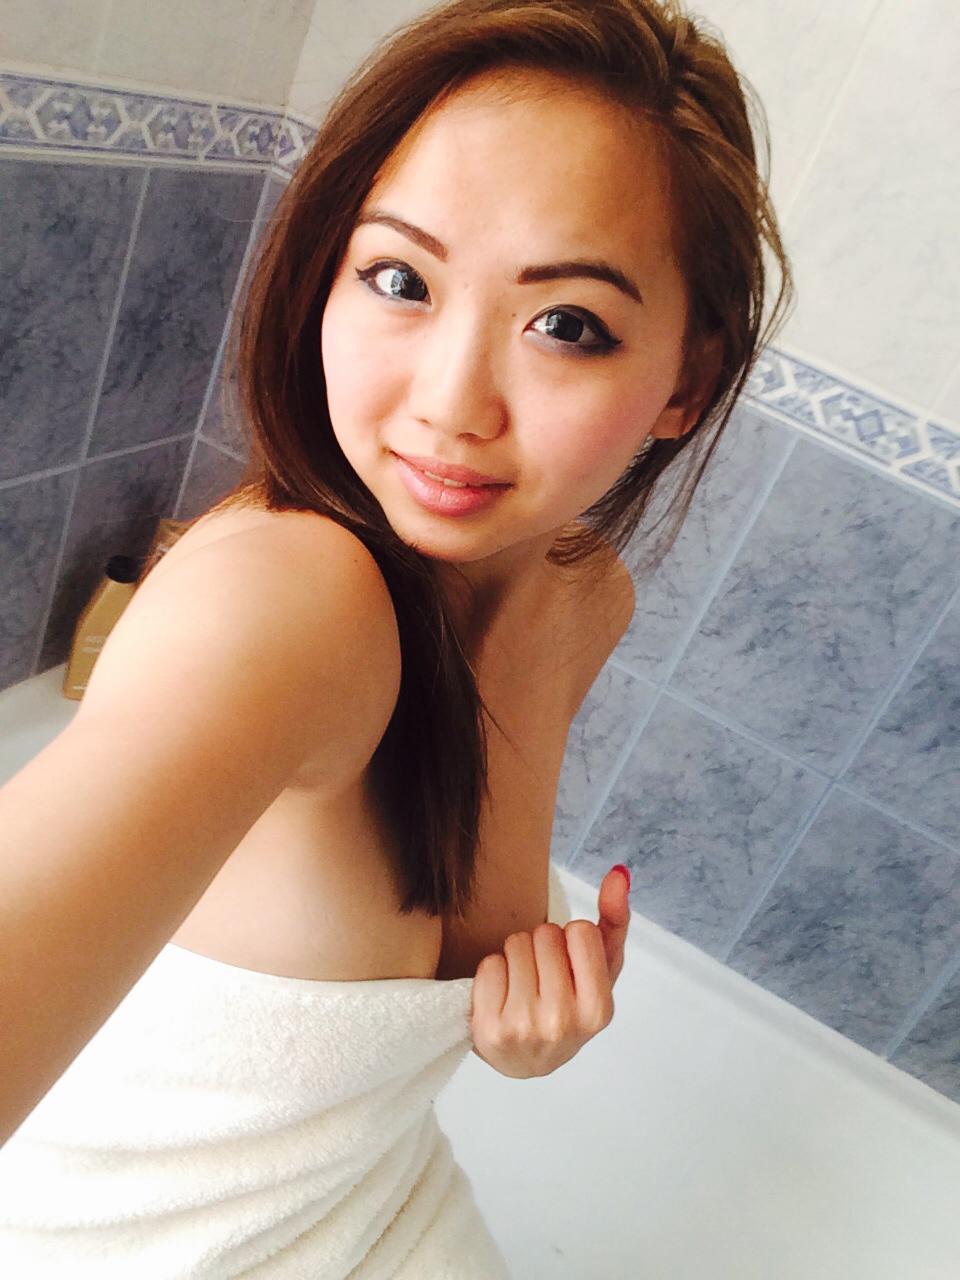 Shower taking asian sexy girl